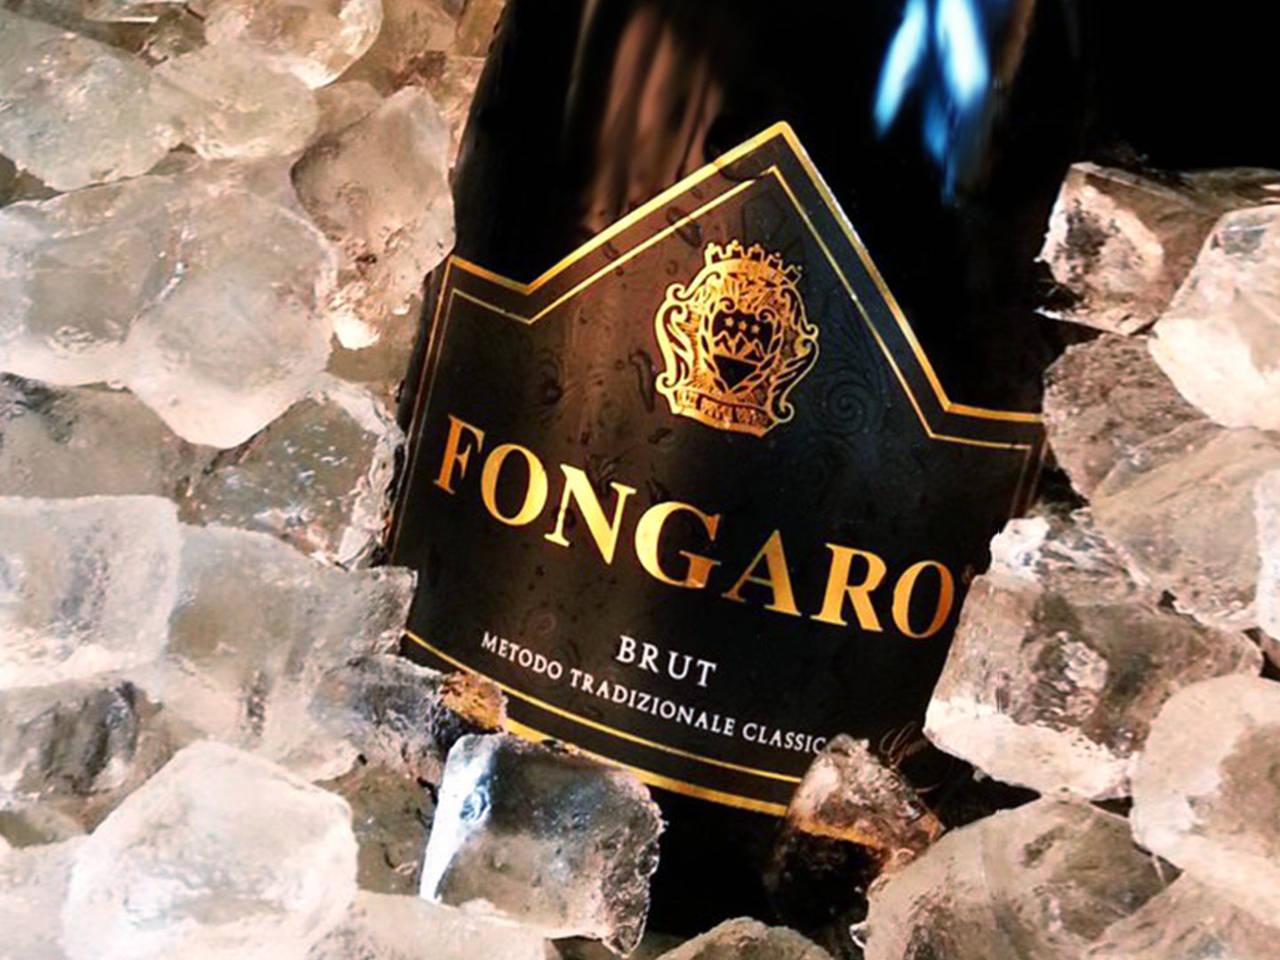 Fongaro, metodo classico